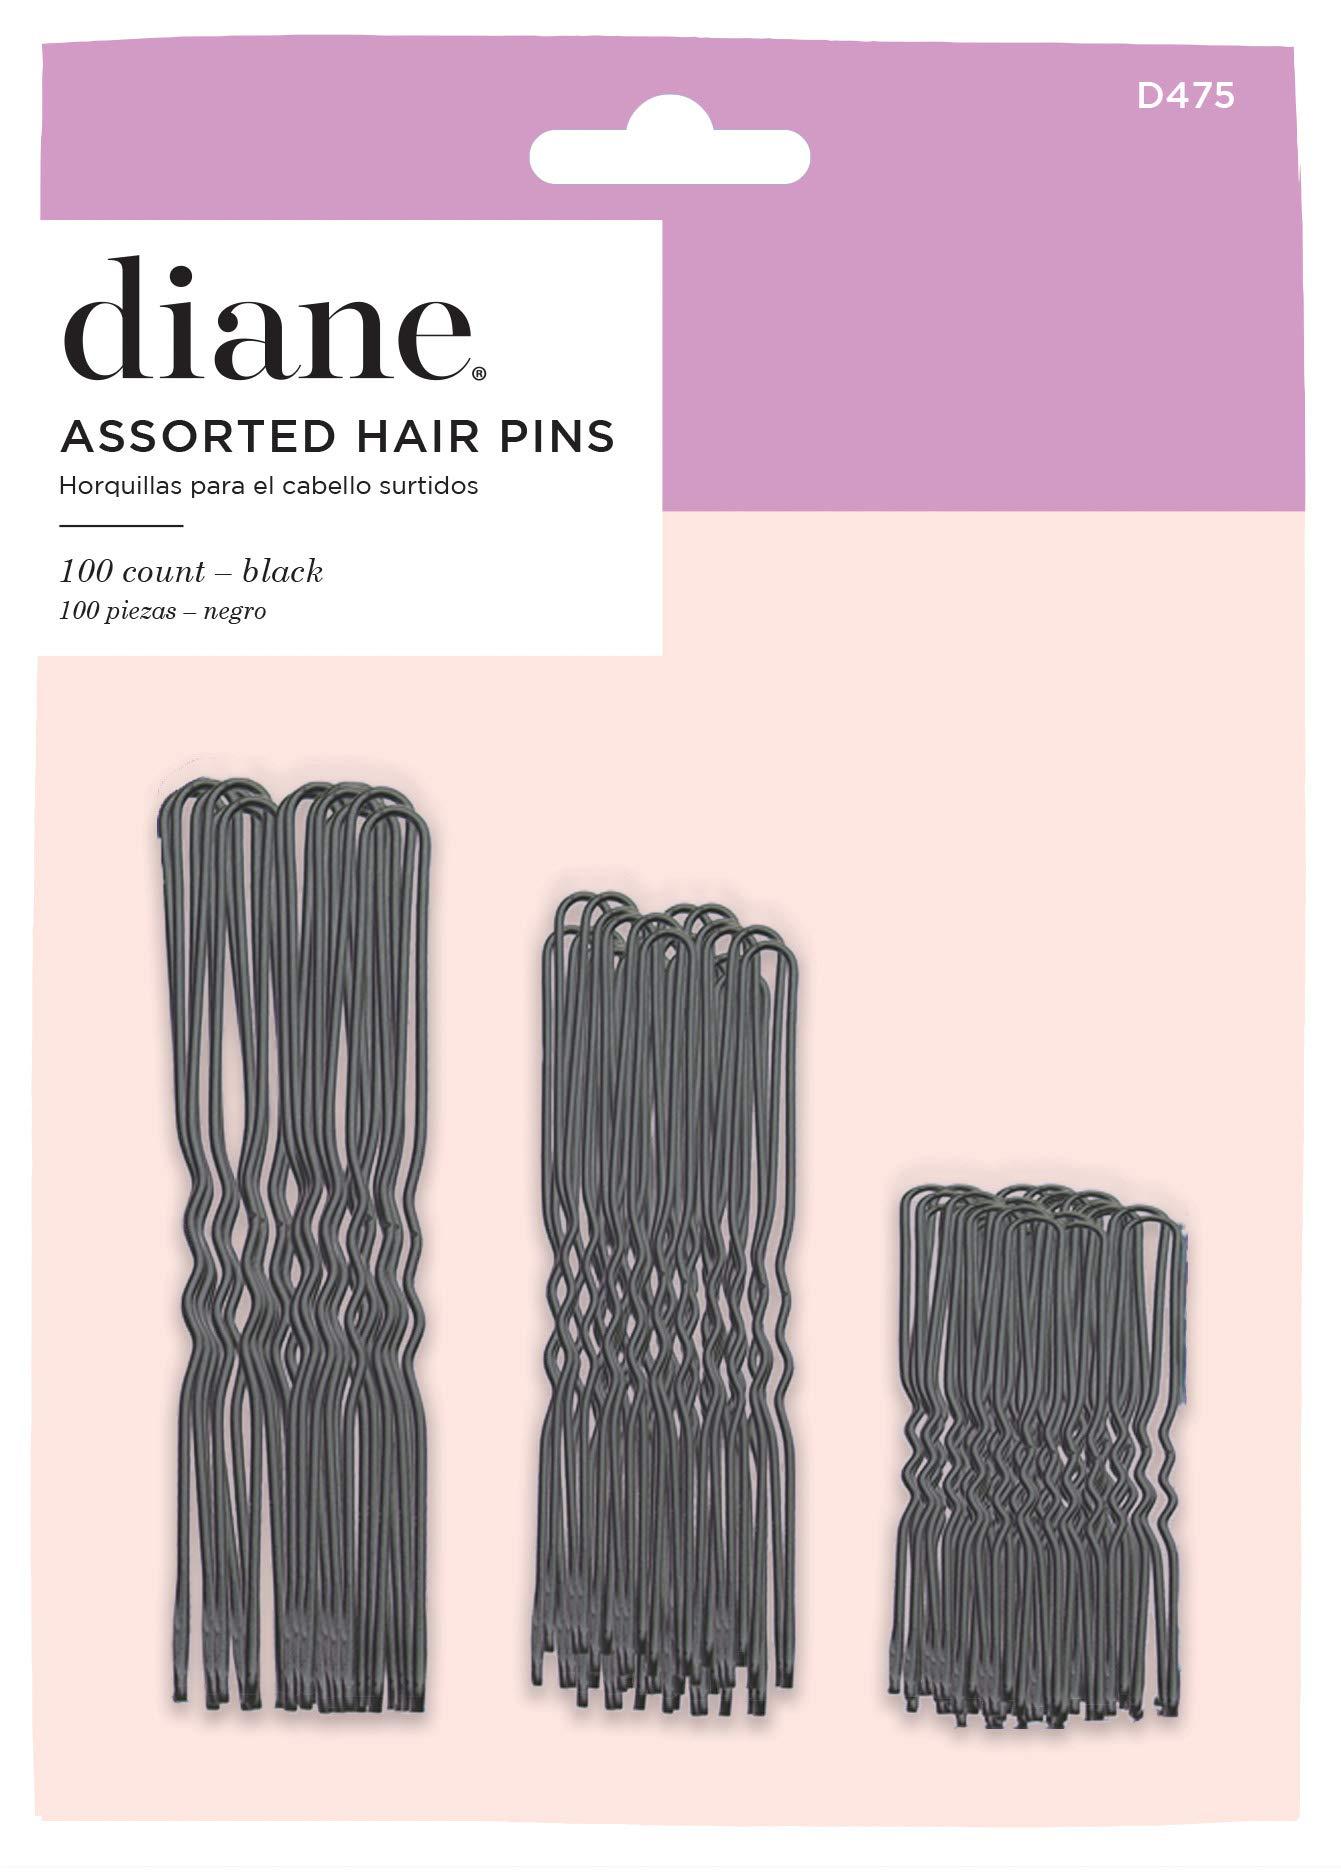 Diane Hair Pins Assorted Size, Black (D475)